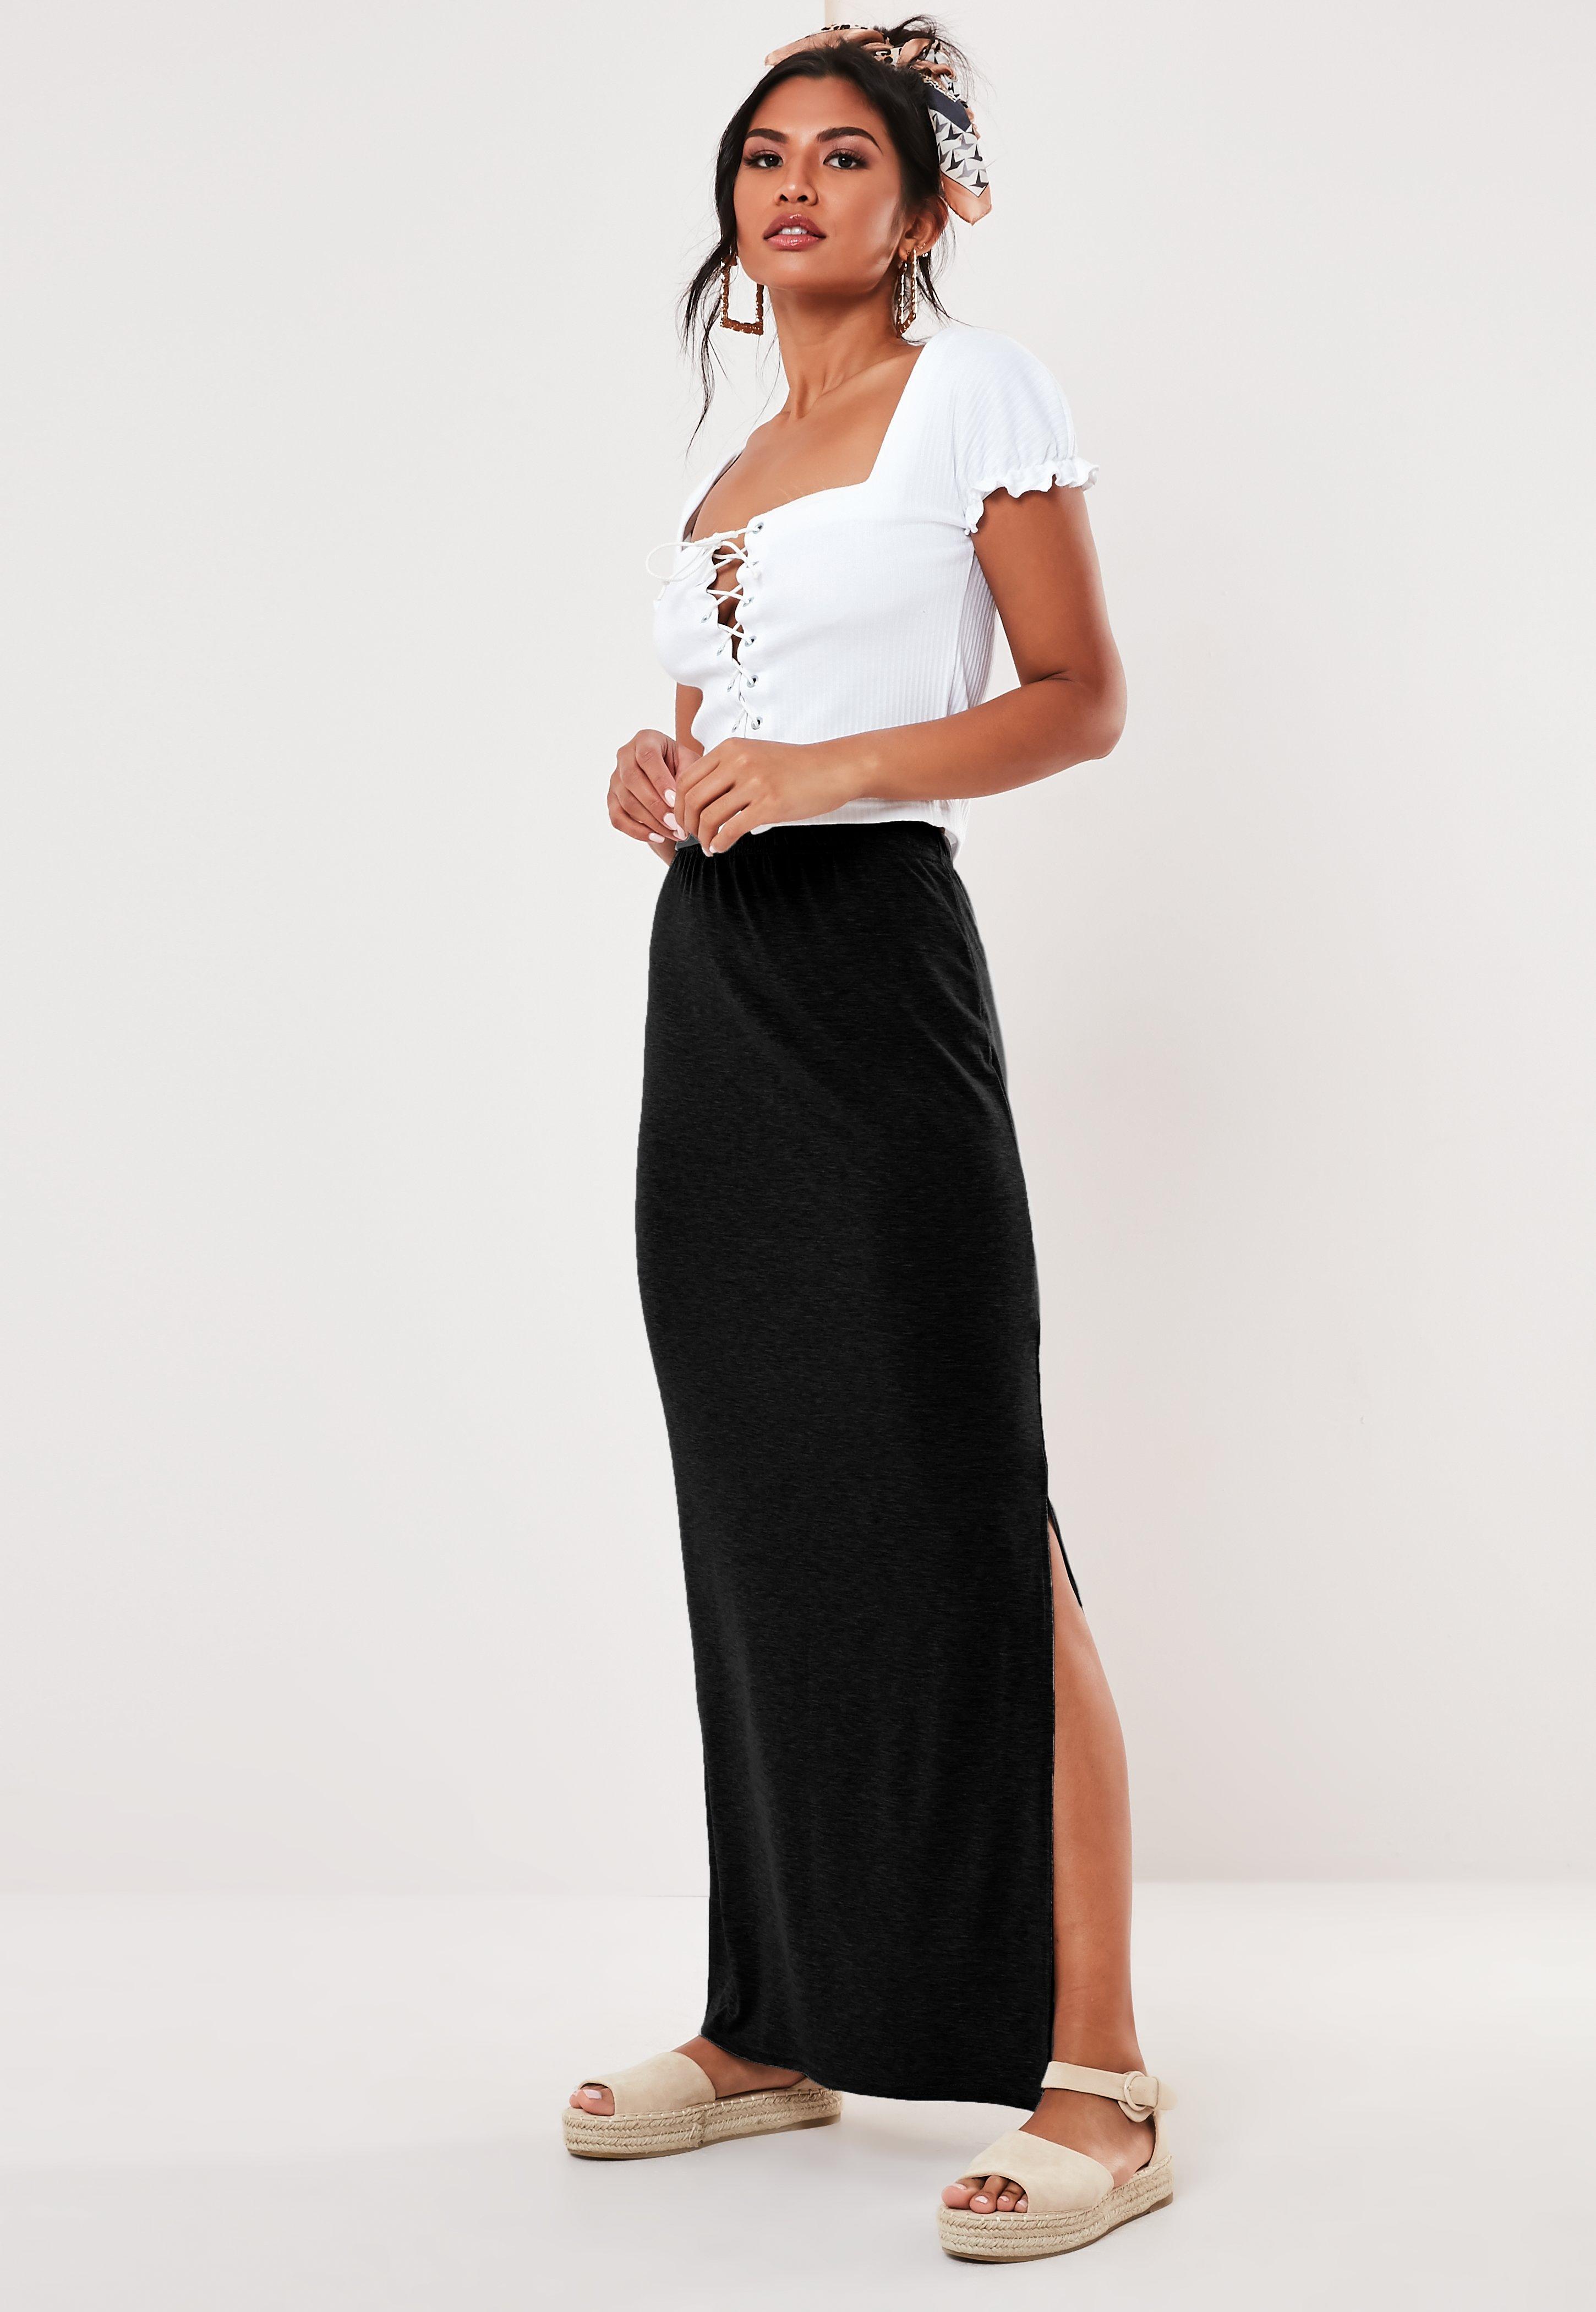 Long Jersey Skirts for Women Ruched Waist 40 Maxi Skirt BLACK